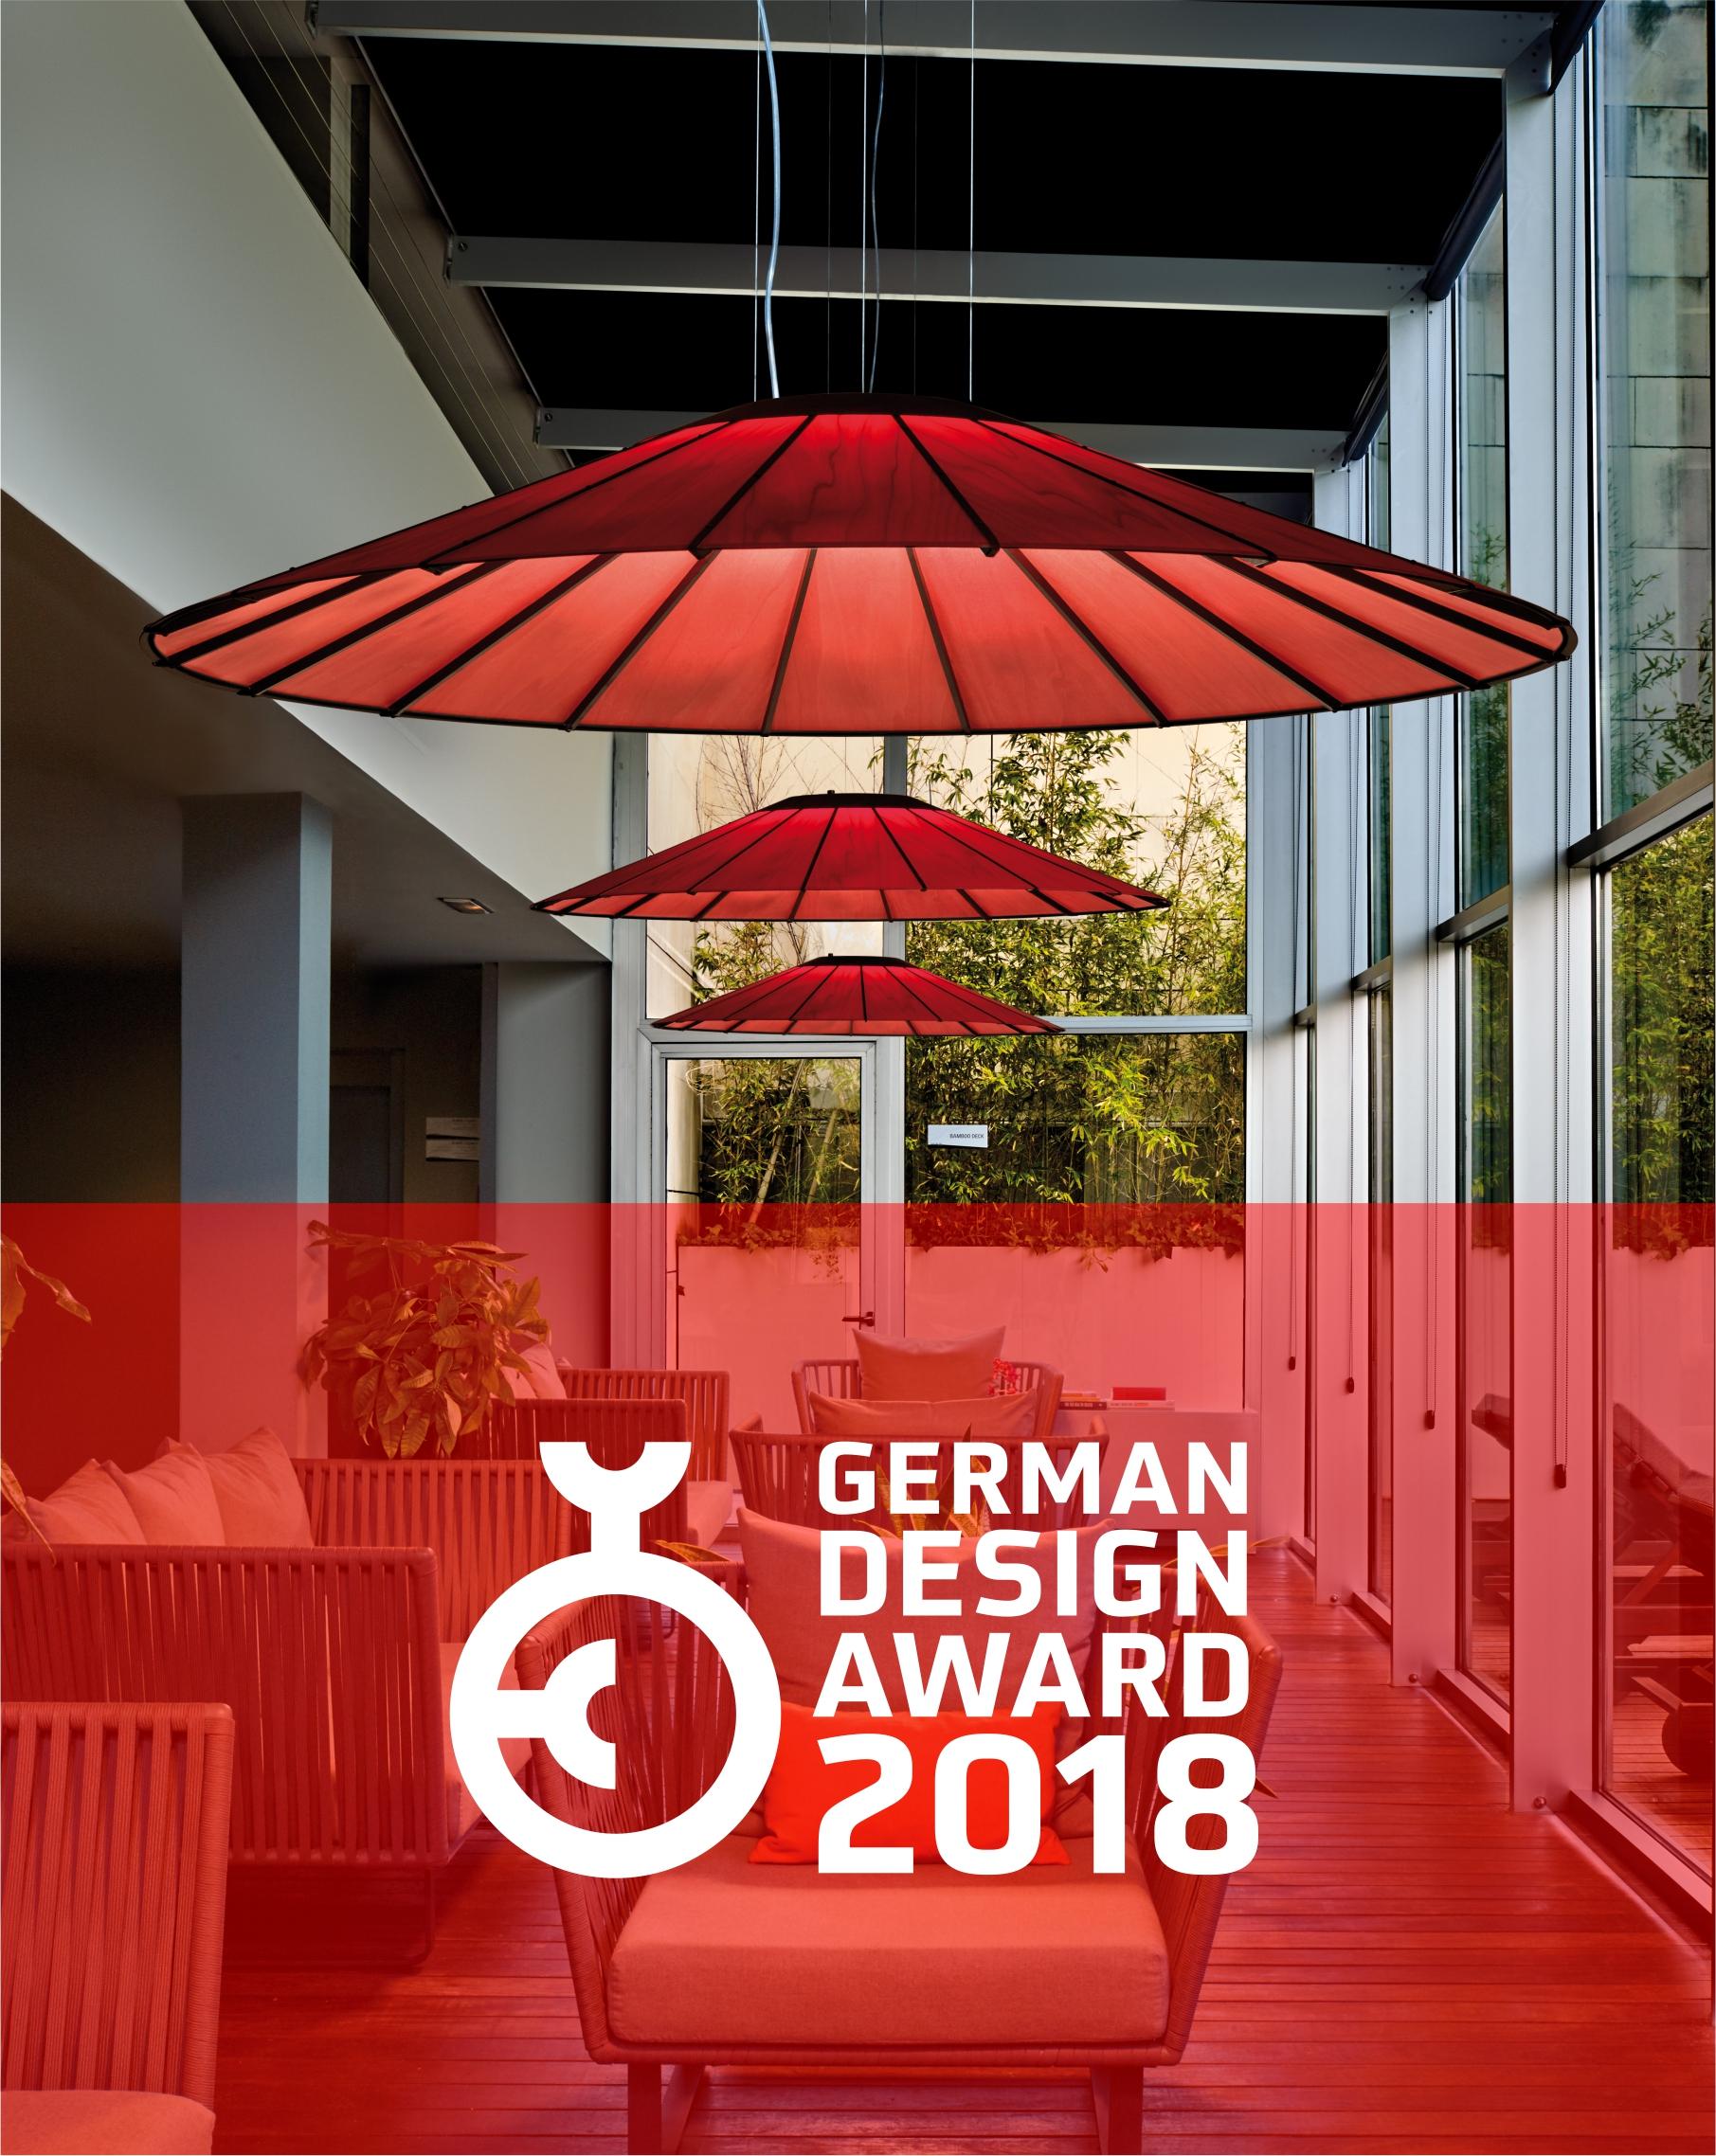 german design award banga 2018 yonoh creative studio product graphic interior design. Black Bedroom Furniture Sets. Home Design Ideas